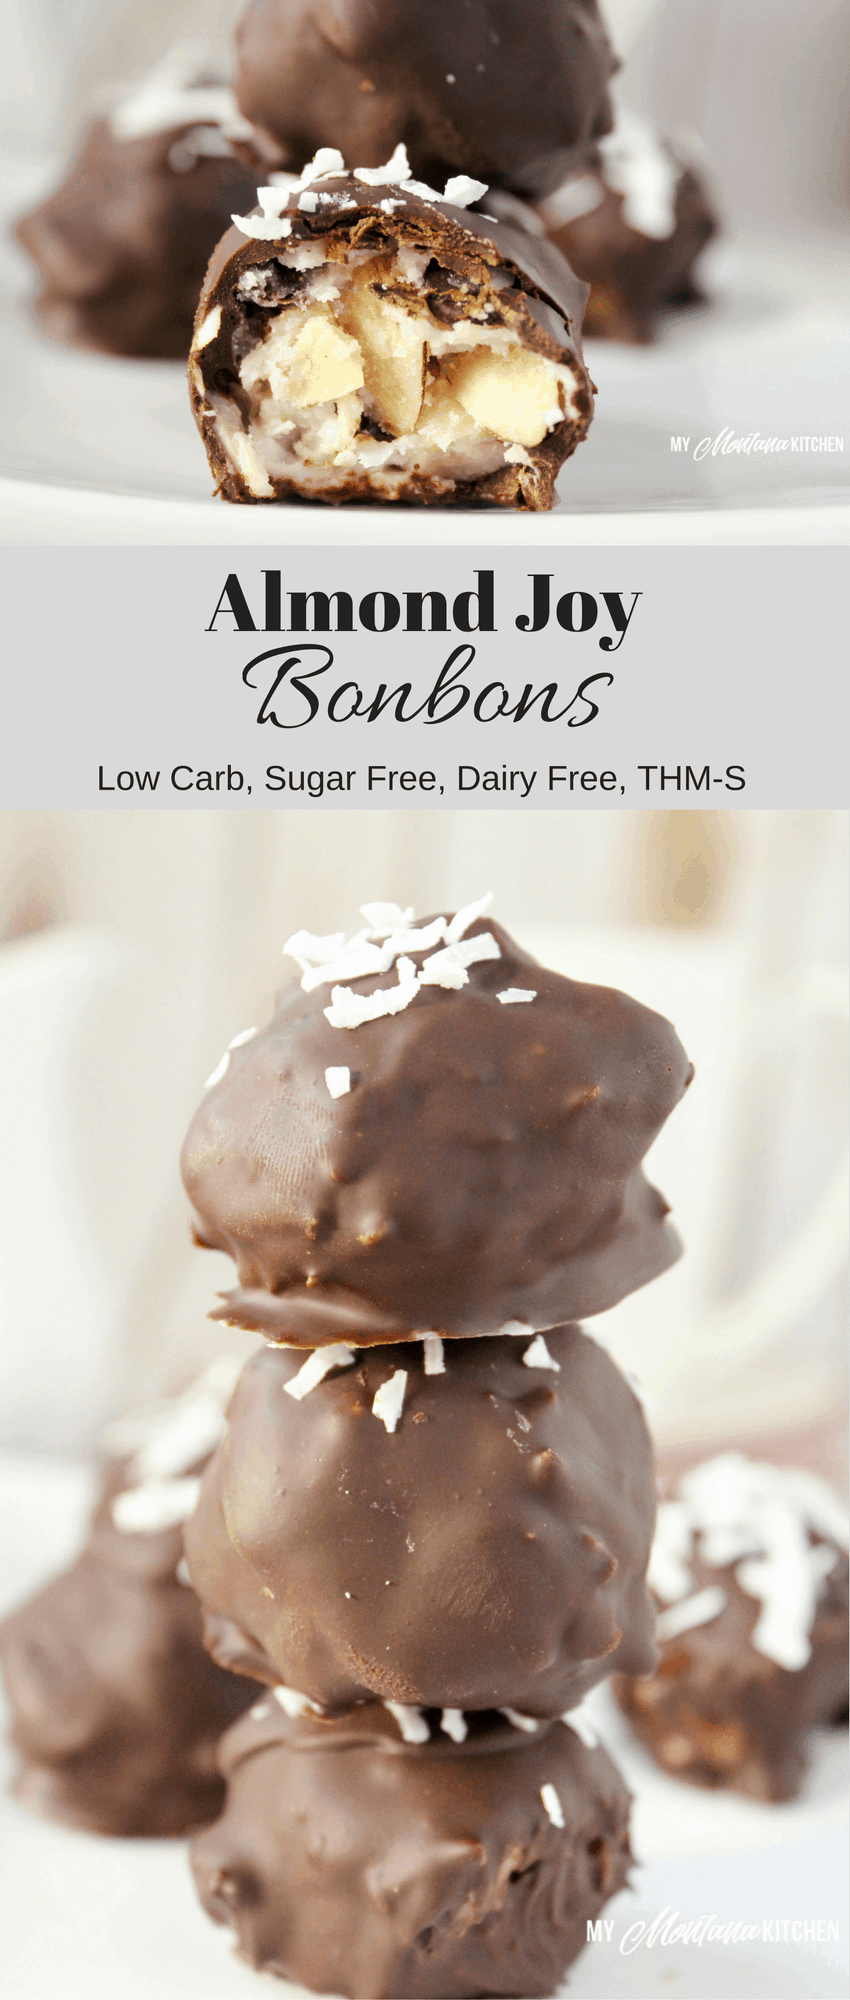 Low Carb Almond Joy Bonbons (Sugar Free, Dairy Free, THM-S) #trimhealthymama #thm #sugarfree #lowcarb #dairyfree #glutenfree #thm-s #bonbons #almondjoy #coconut #ketocandy #lowcarbcandy #christmas